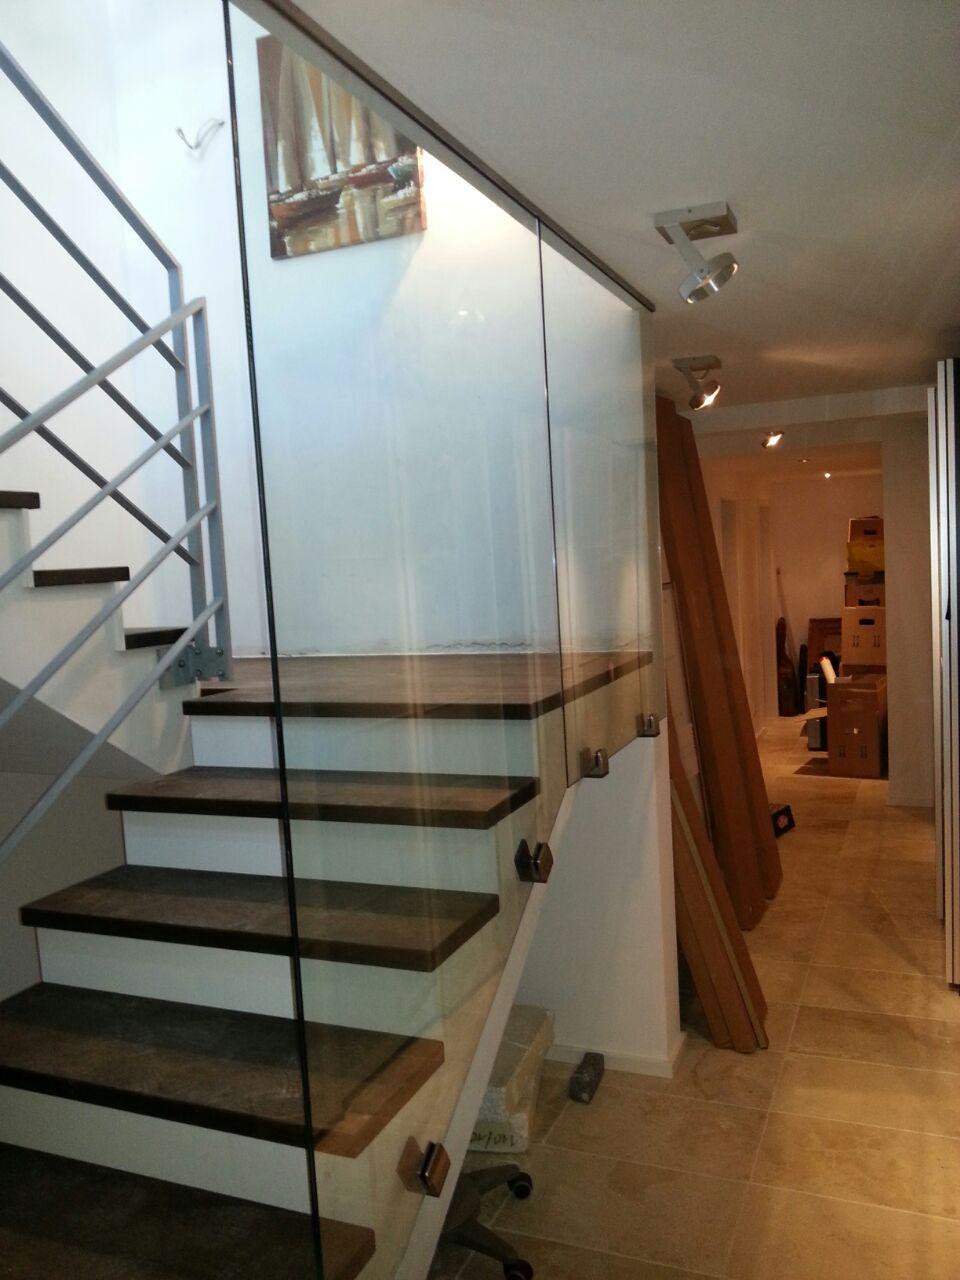 Absturzsicherung Treppe absturzsicherung treppe hausdesign pro